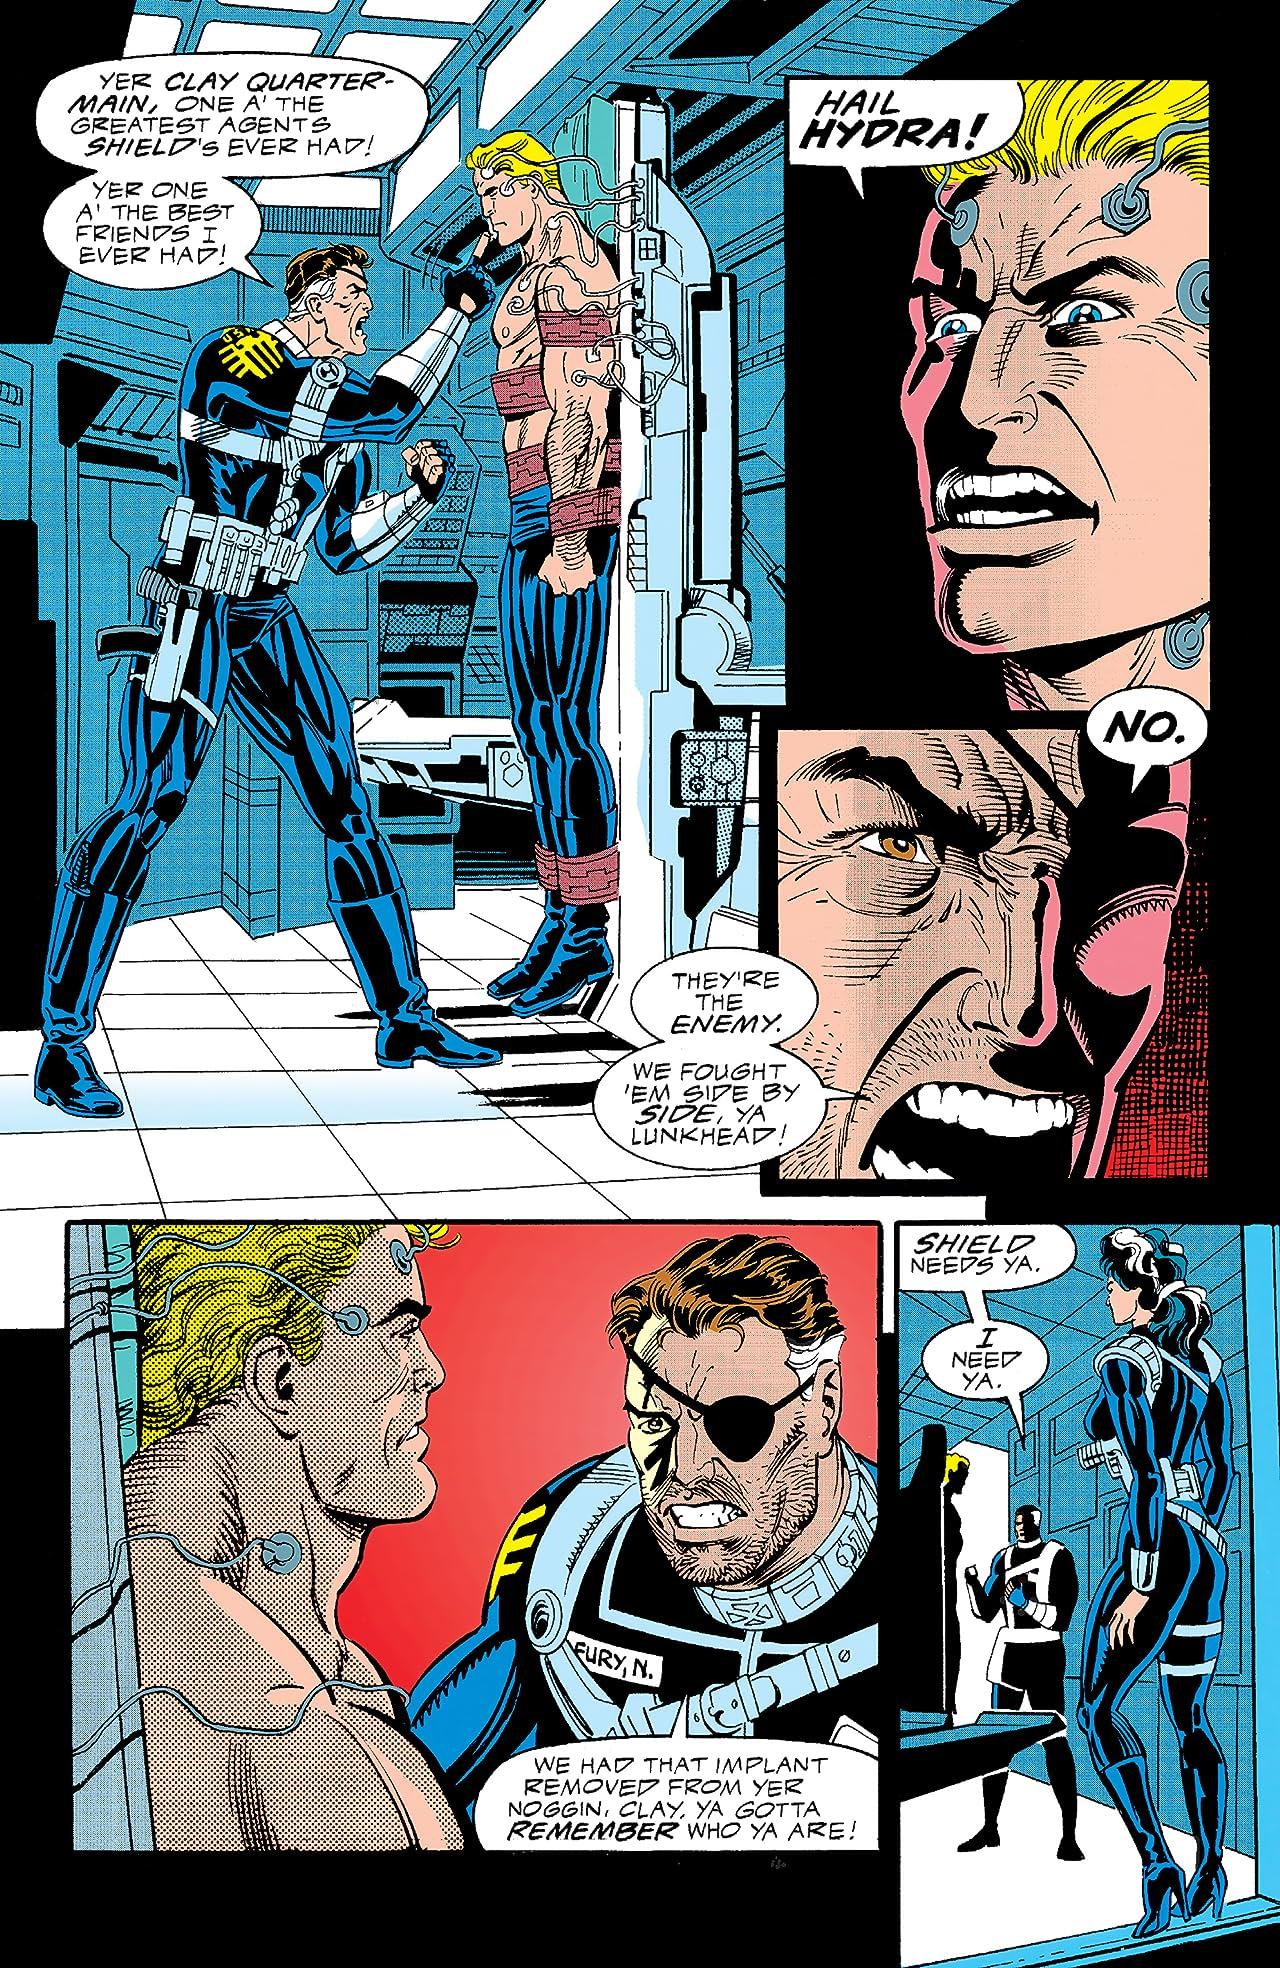 Nick Fury, Agent of S.H.I.E.L.D. (1989-1992) #46